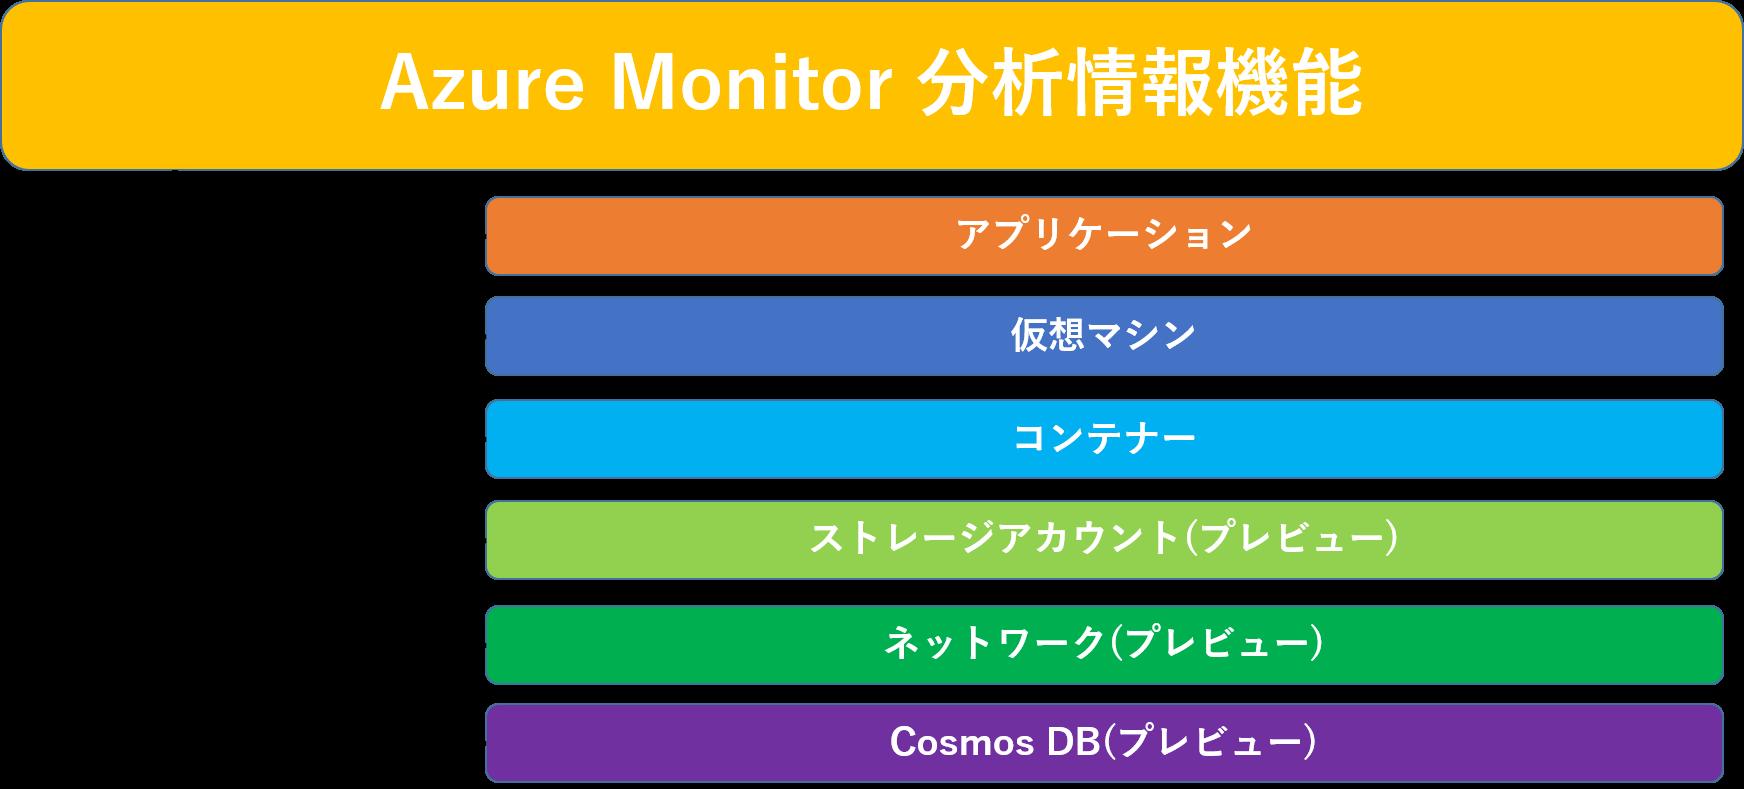 Azure Monitor6つの重要な機能